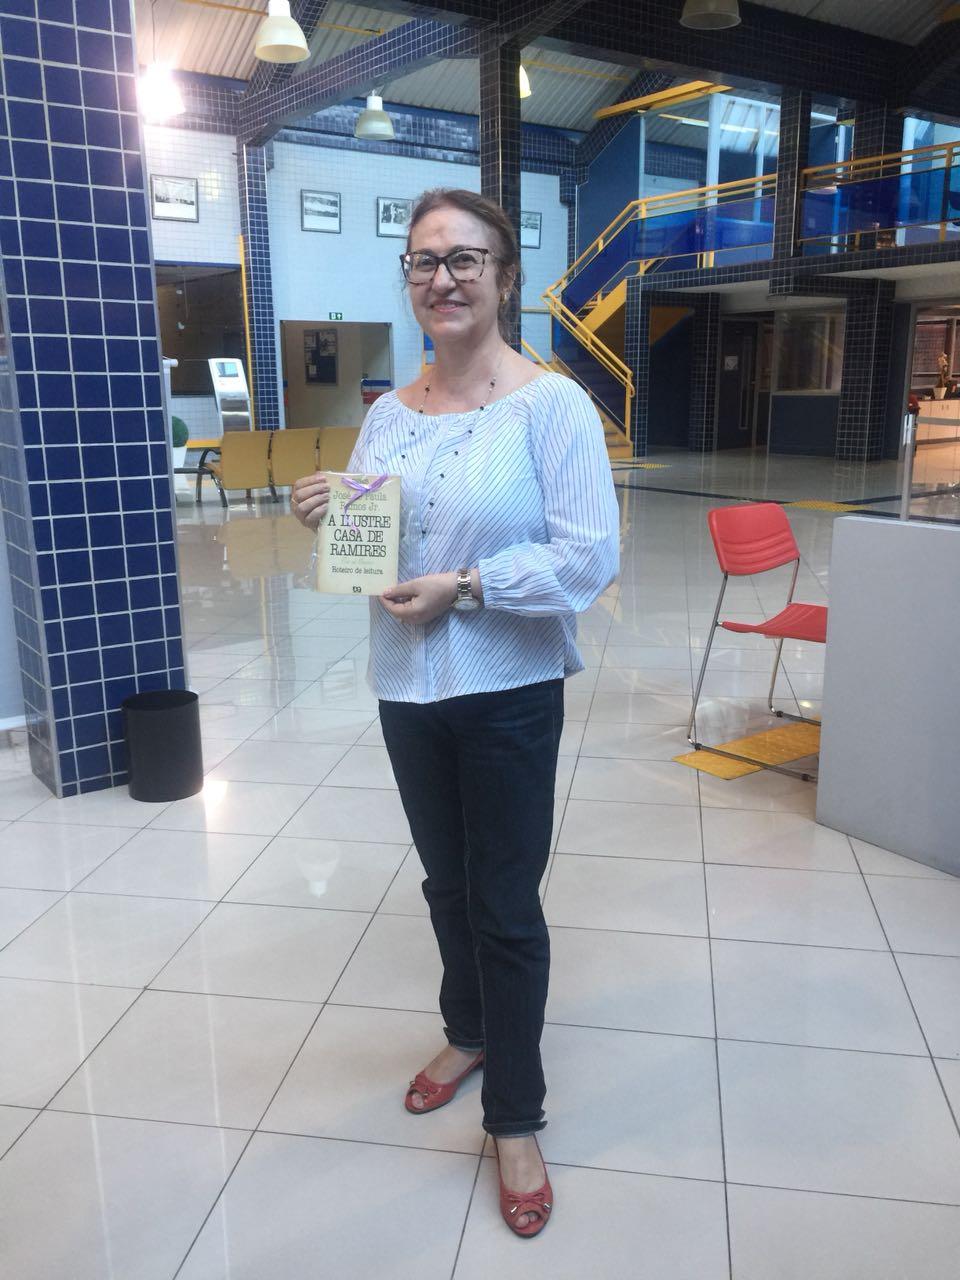 Projeto Janela Aberta à Leitura : ler te dá asas ao universo 4